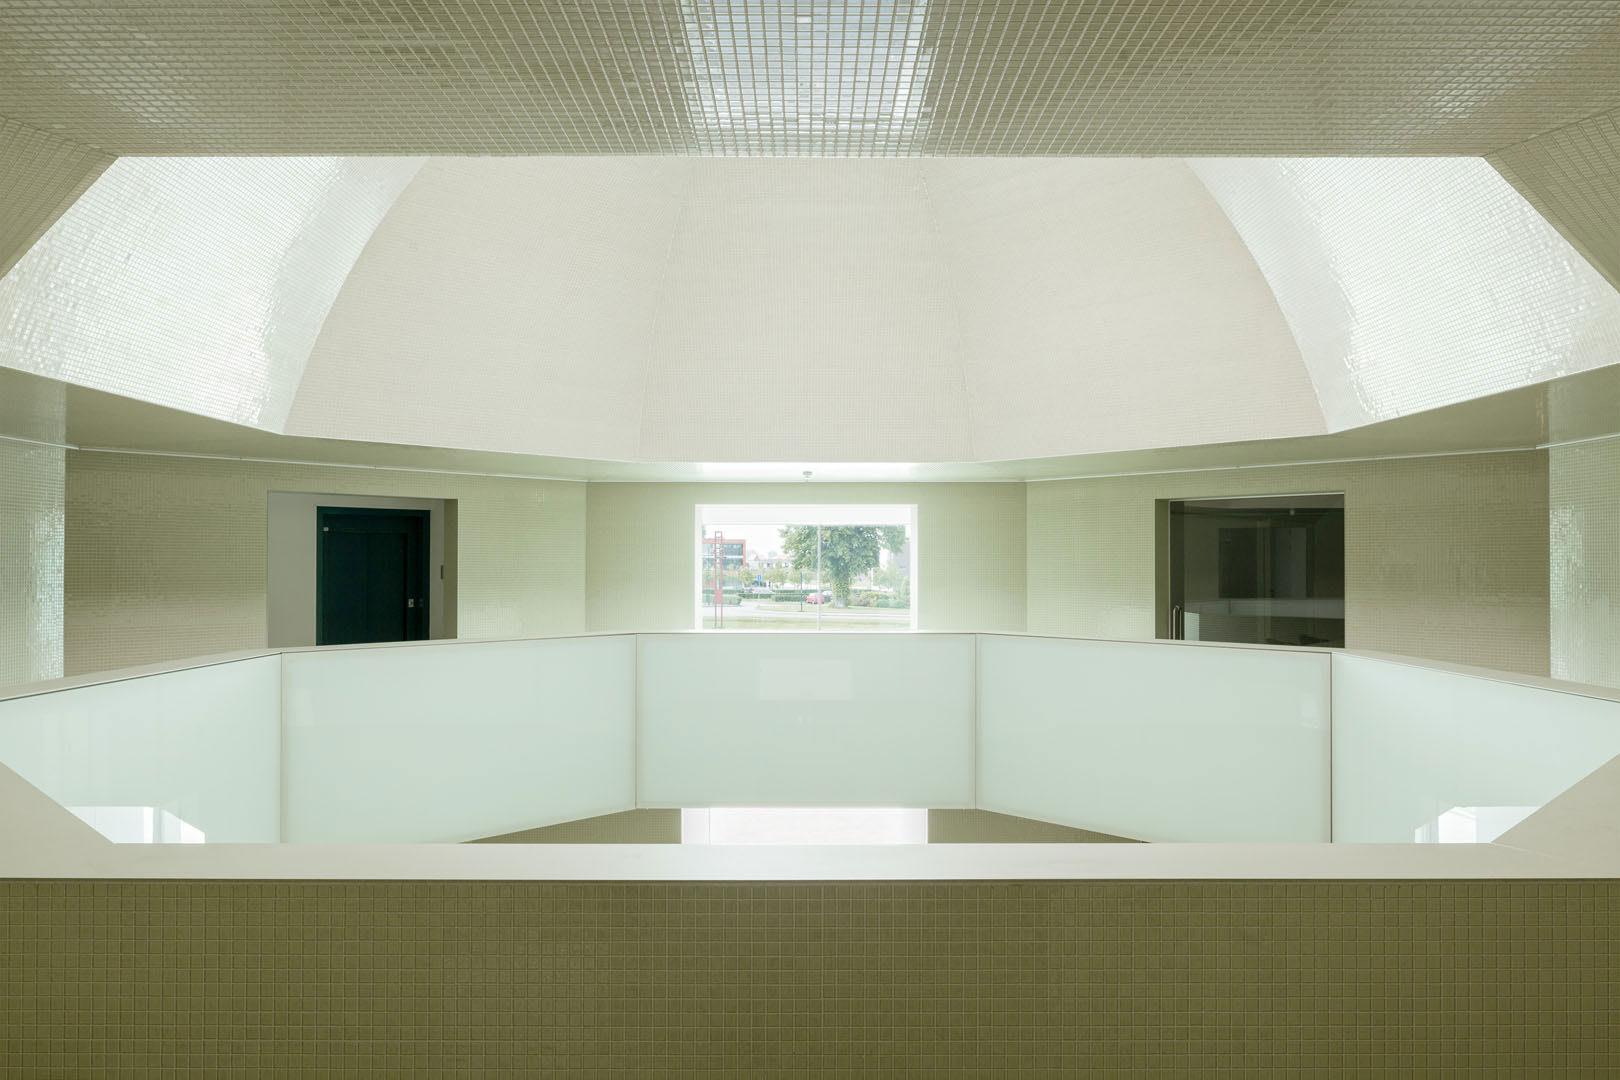 Atelier Du Luminaire Toulouse atelier kempe thill, ulrich schwarz · transformation of the